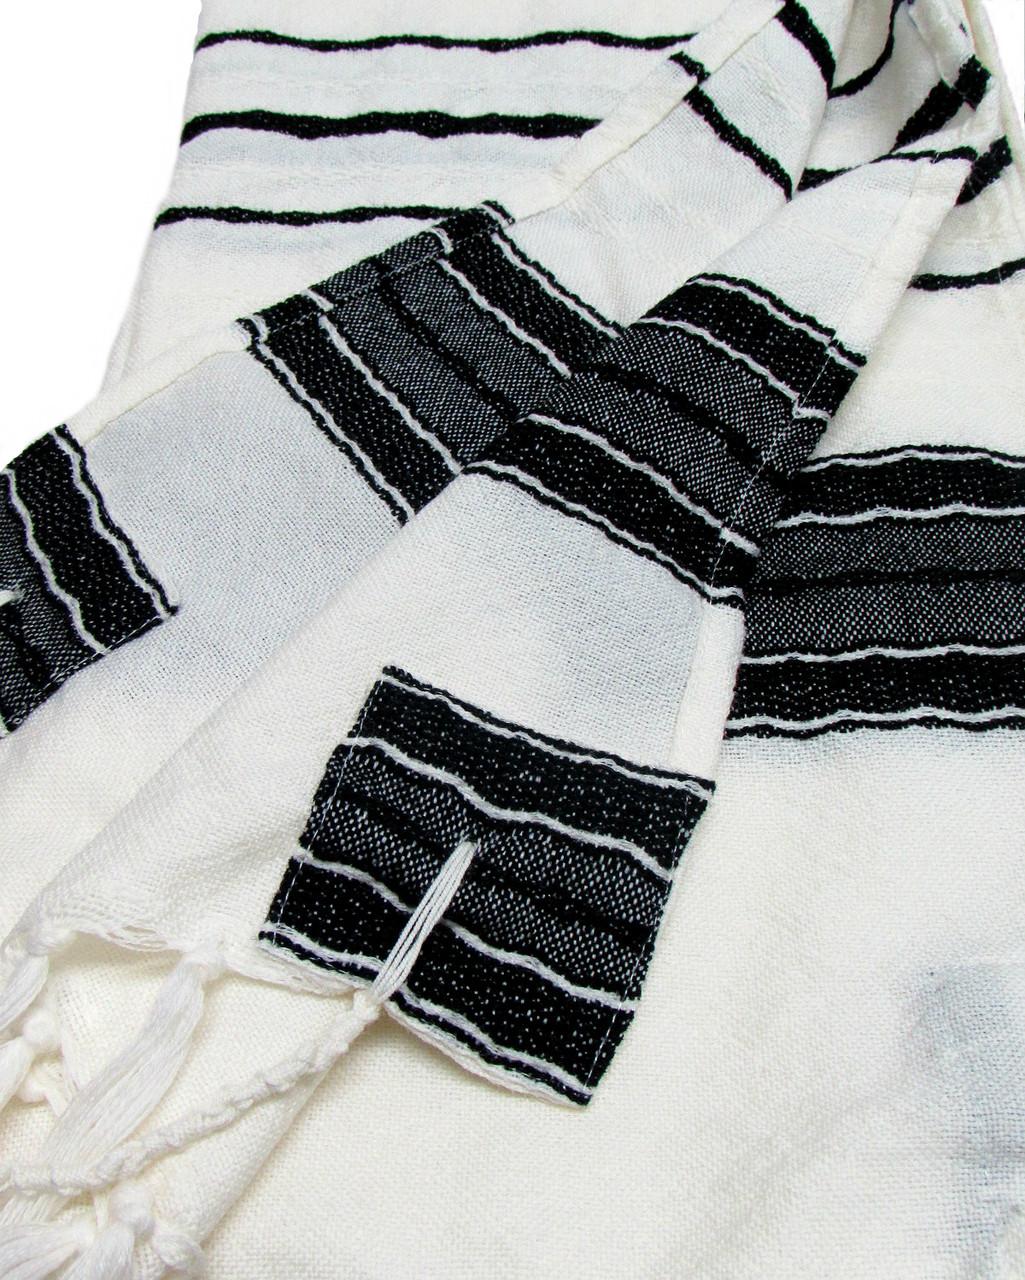 Handwoven Black-Striped Gabrieli Tallit